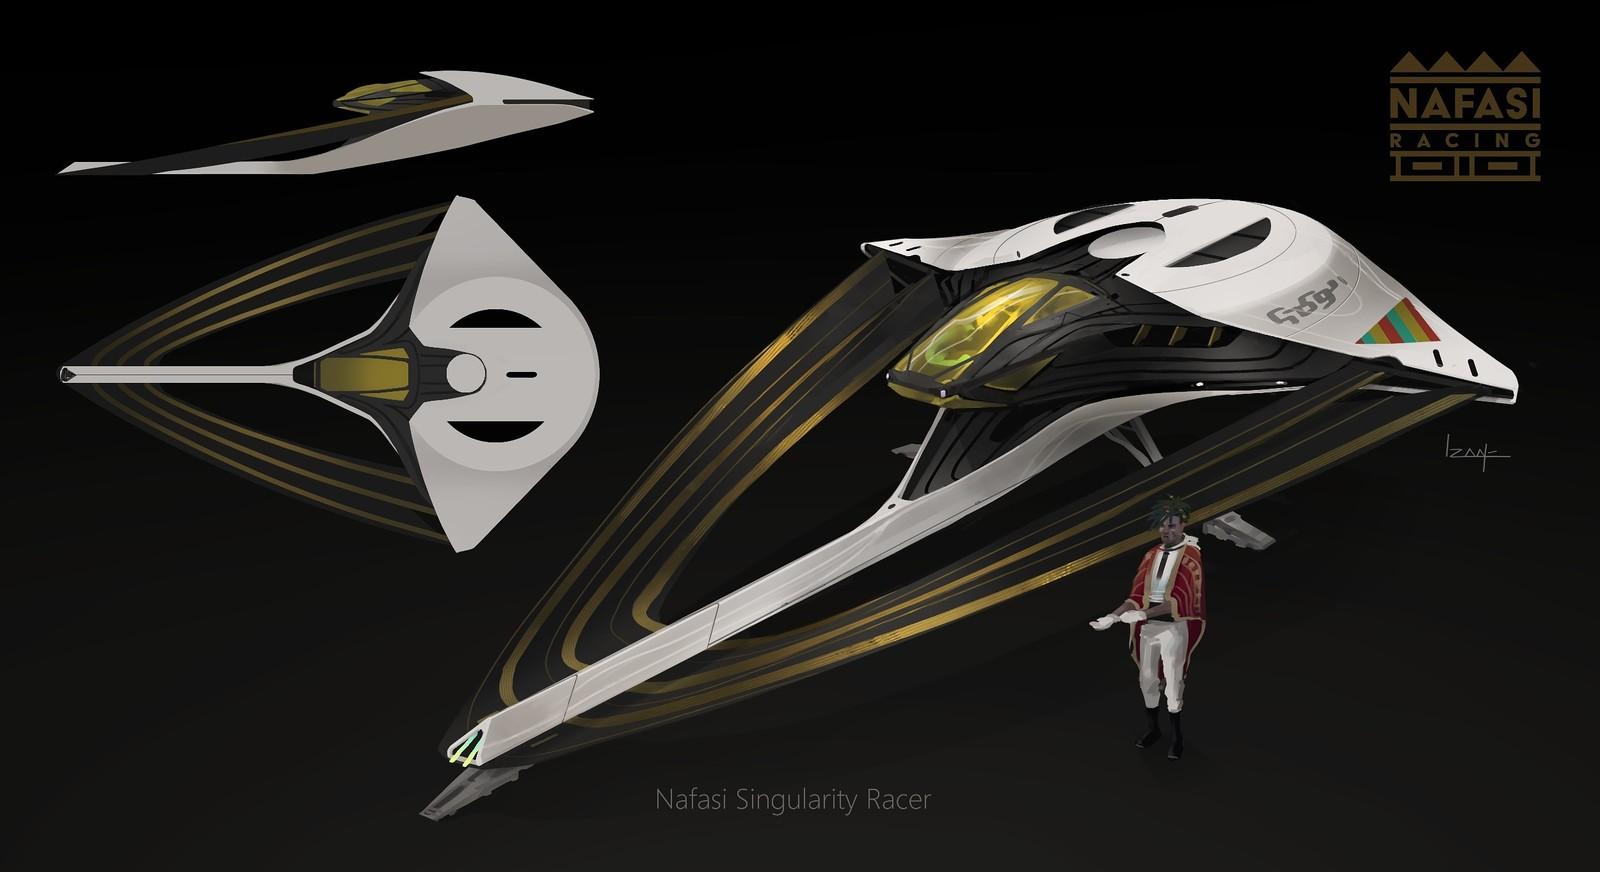 Nafasi Racer